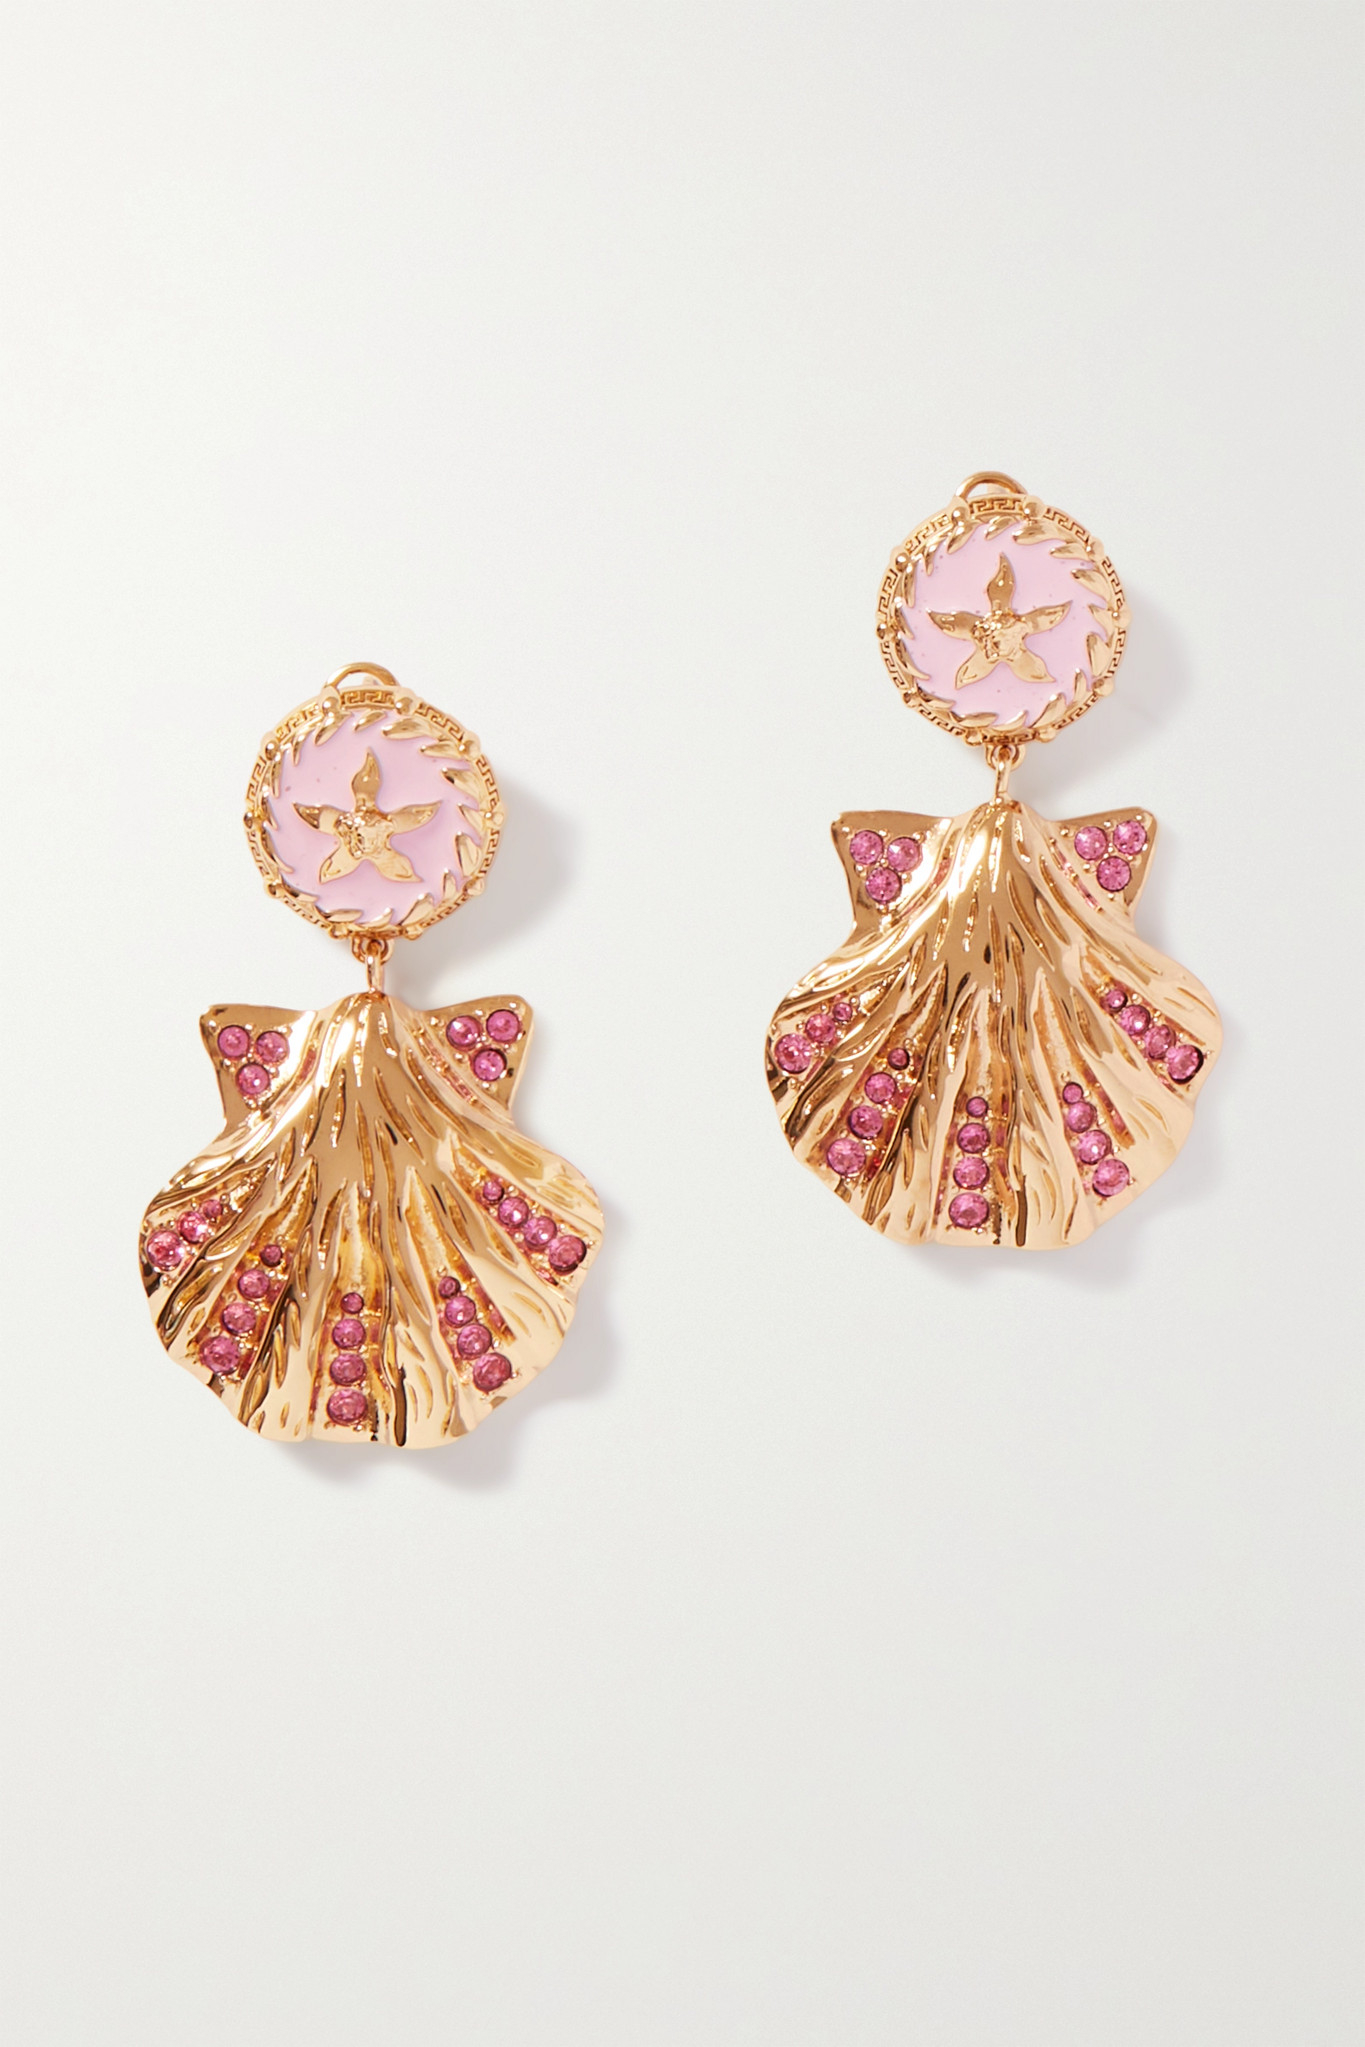 VERSACE - Trésor De La Mer Gold-tone, Enamel And Crystal Earrings - Pink - one size